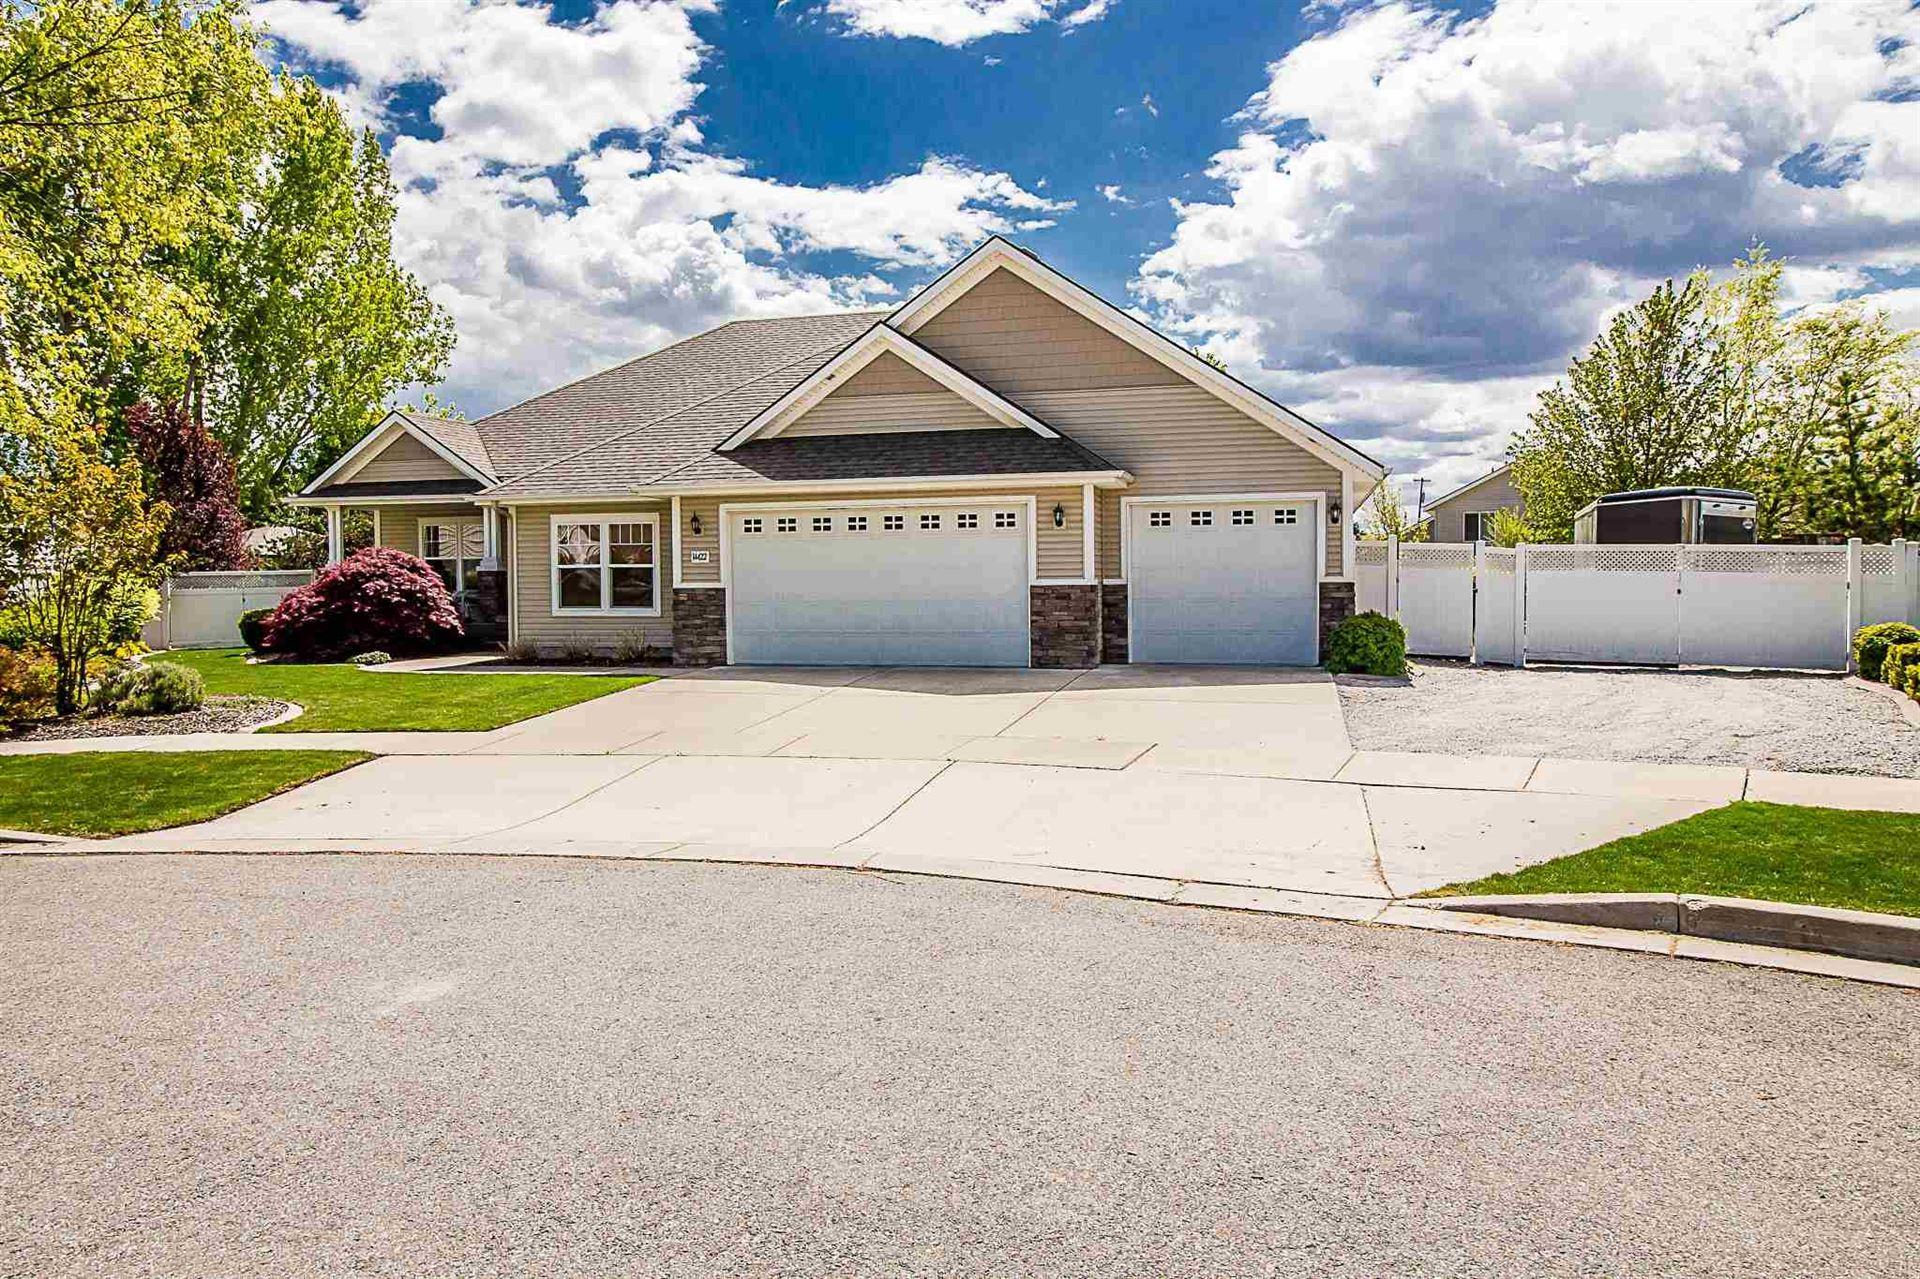 14422 E Olympic Ave, Spokane Valley, WA 99216 - #: 202115505